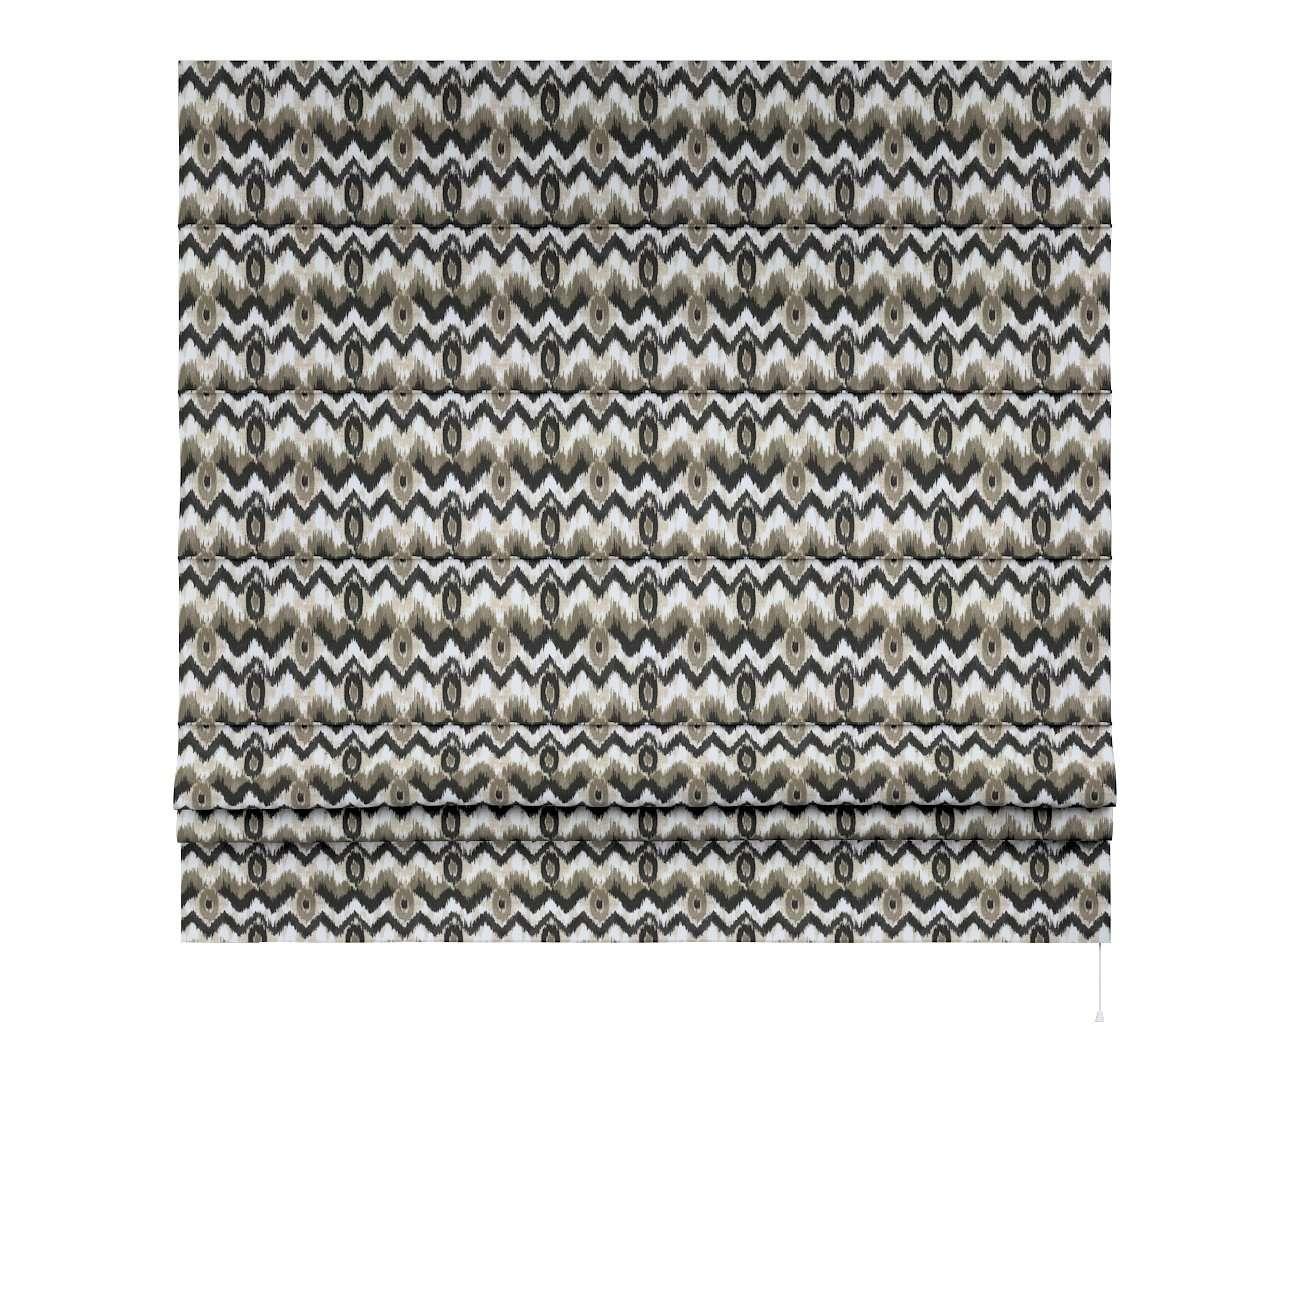 Rímska roleta Padva V kolekcii Modern, tkanina: 141-88